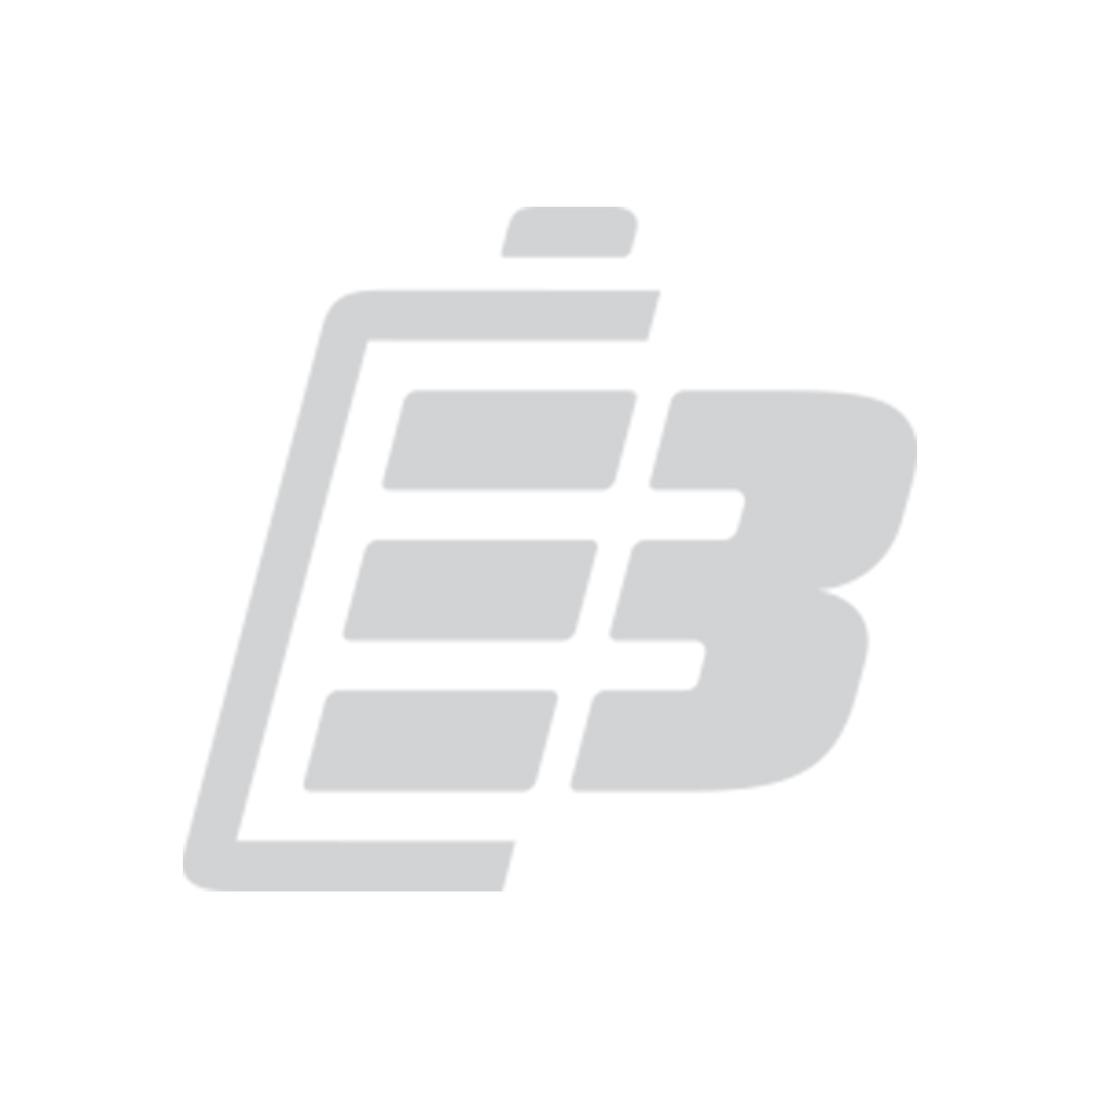 Laptop battery Asus X555_1